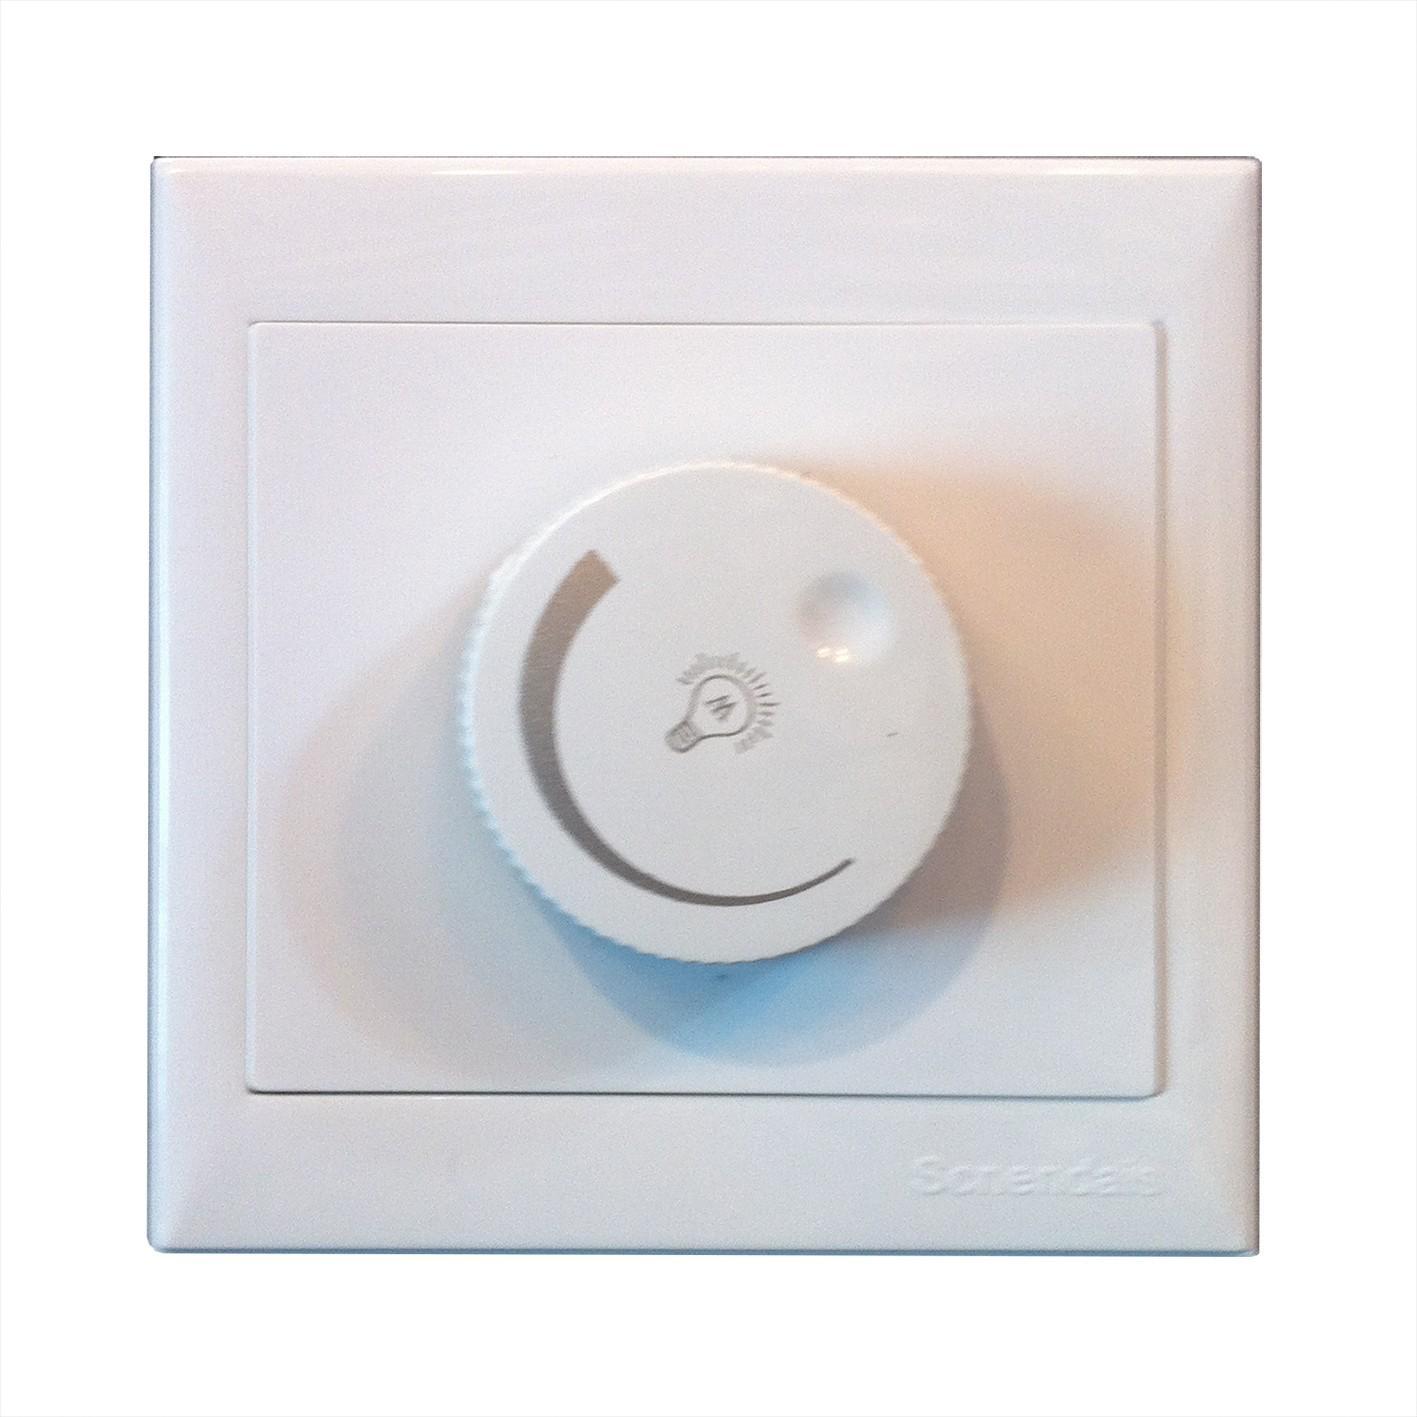 Dimmer Switch for LED lighting